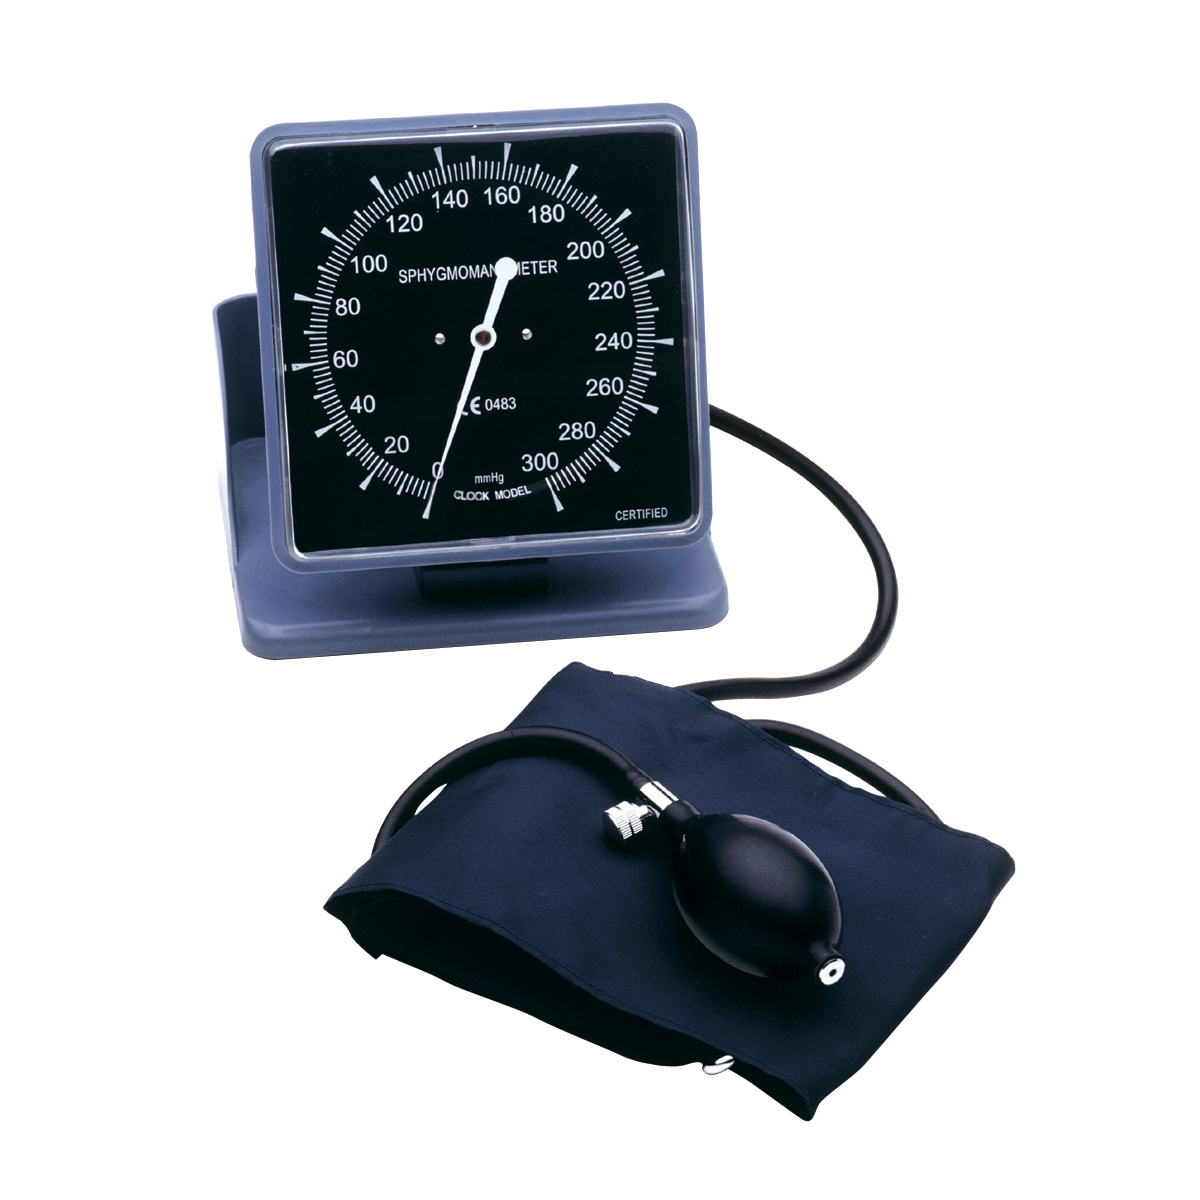 Topaz Deluxe Aneroid Sphygmomanometer